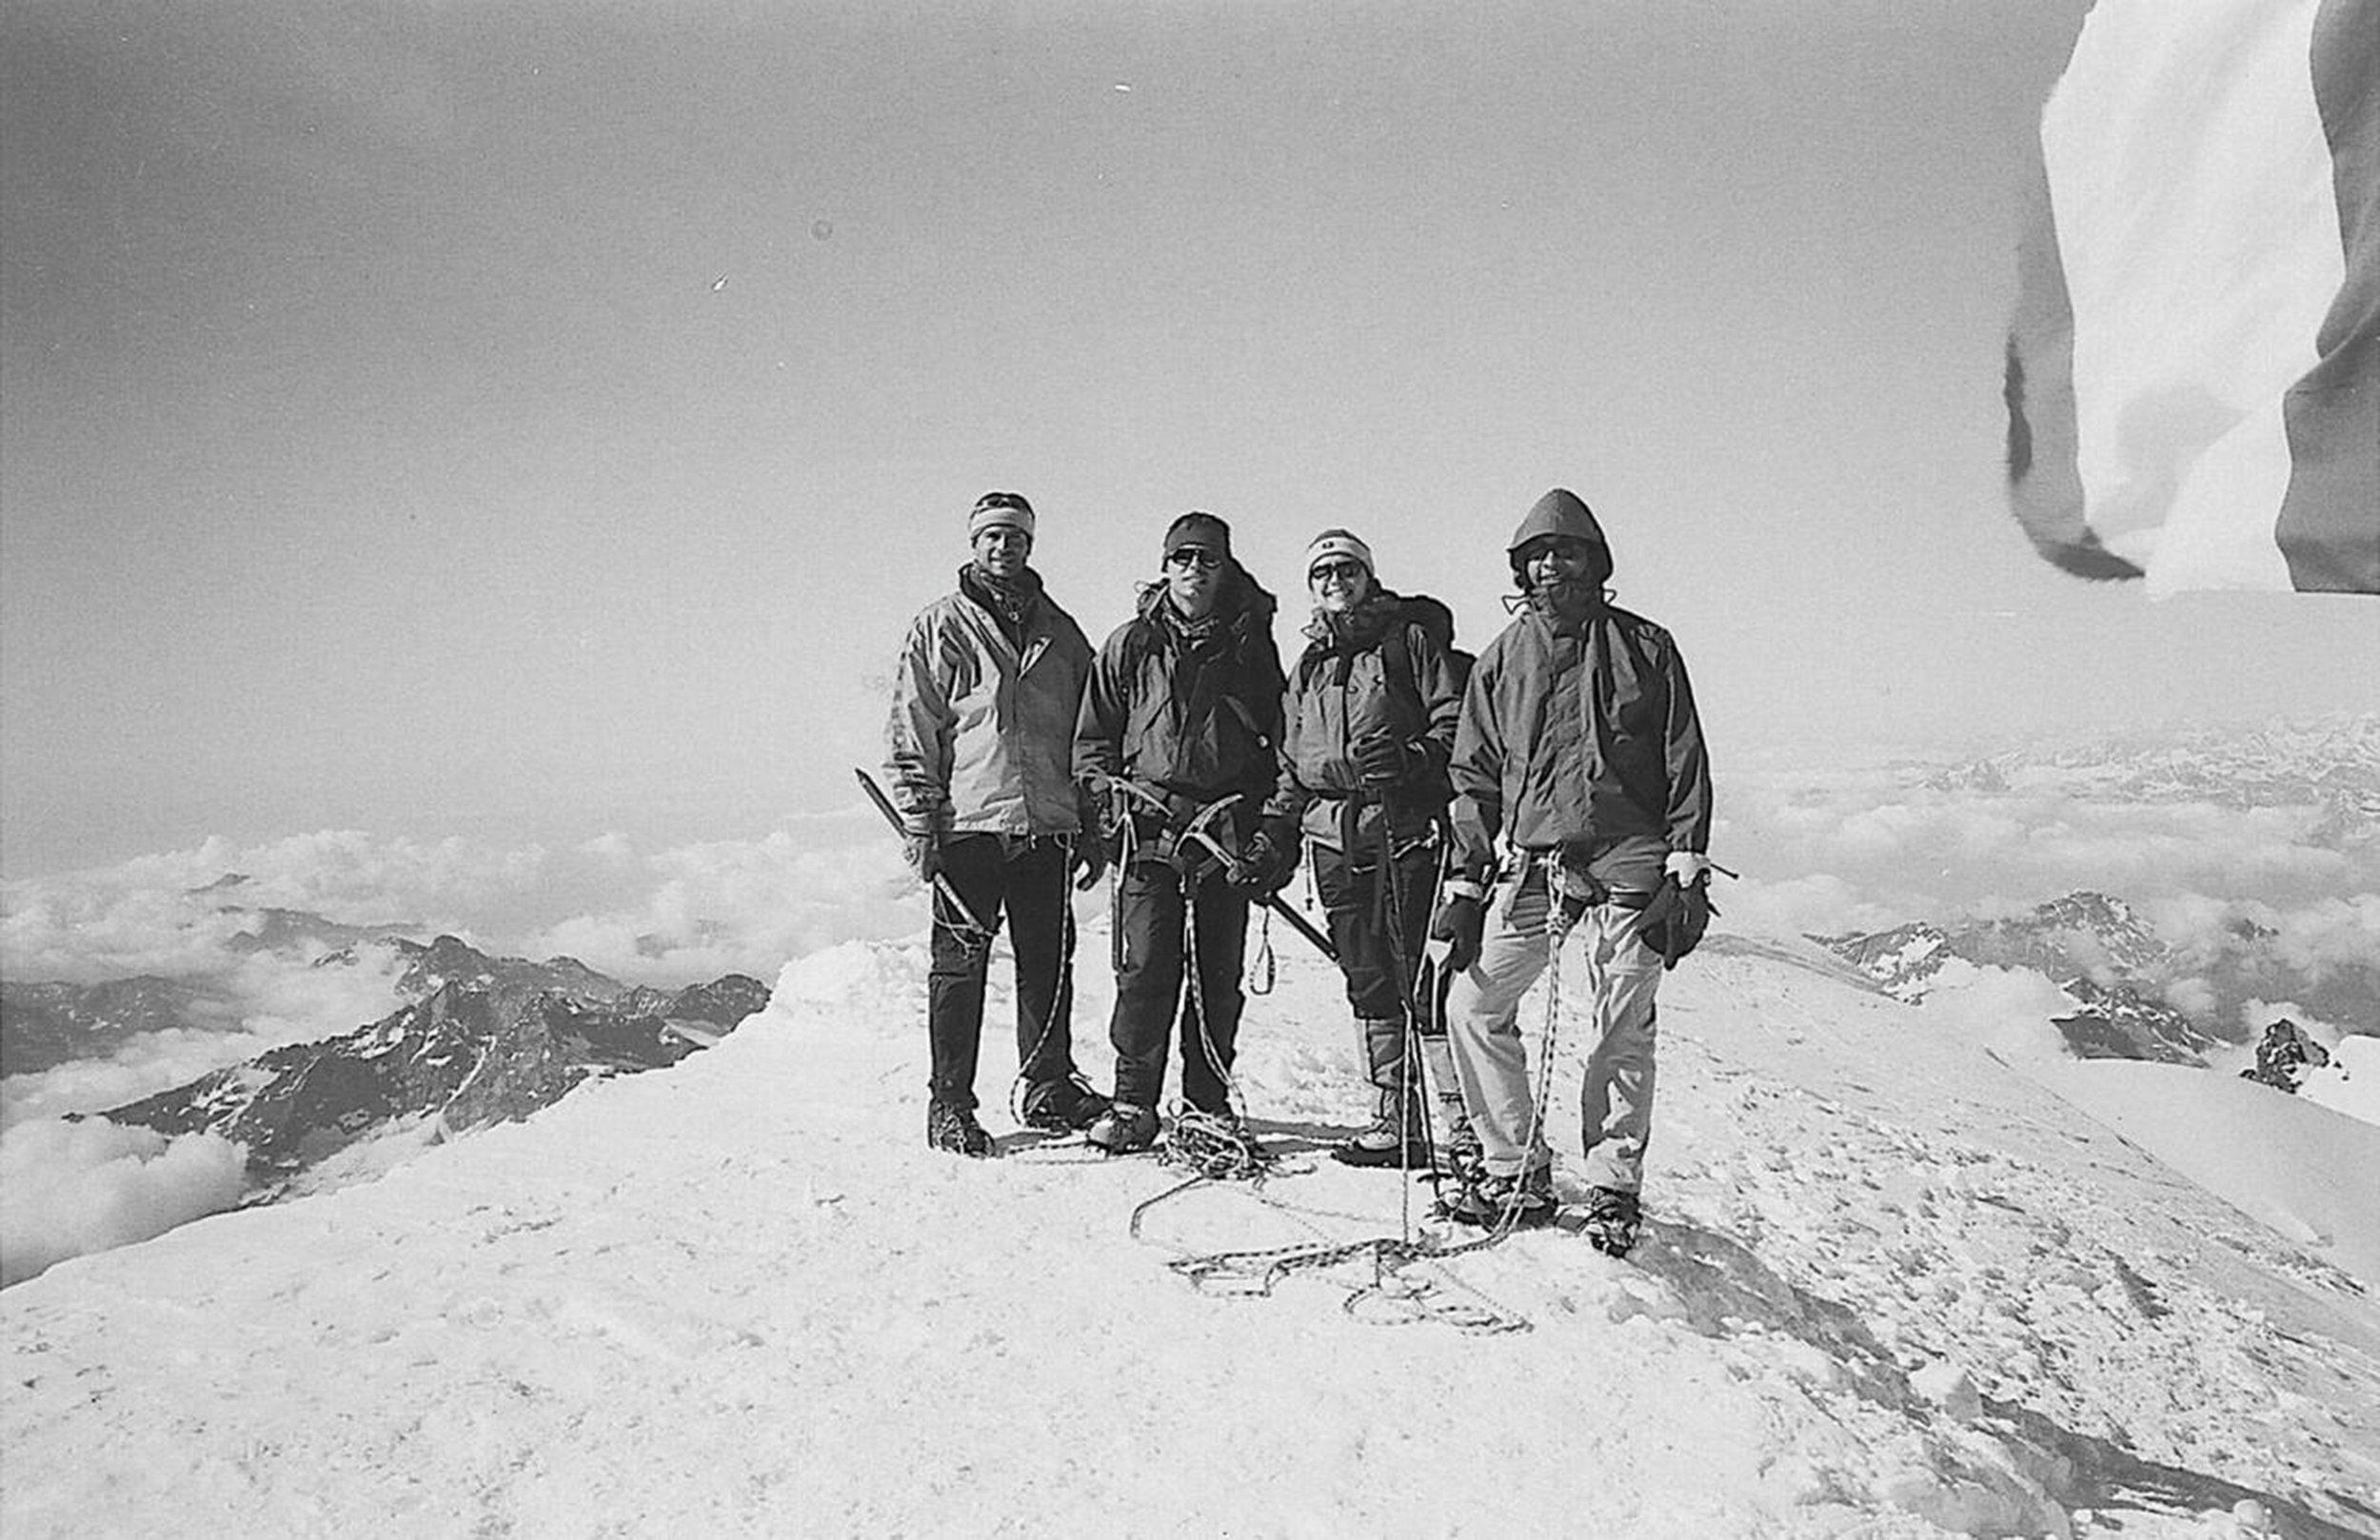 Francis Jacquerye (far right), Monte Rosa, 4554 metre (14941 ft.) above sea level.